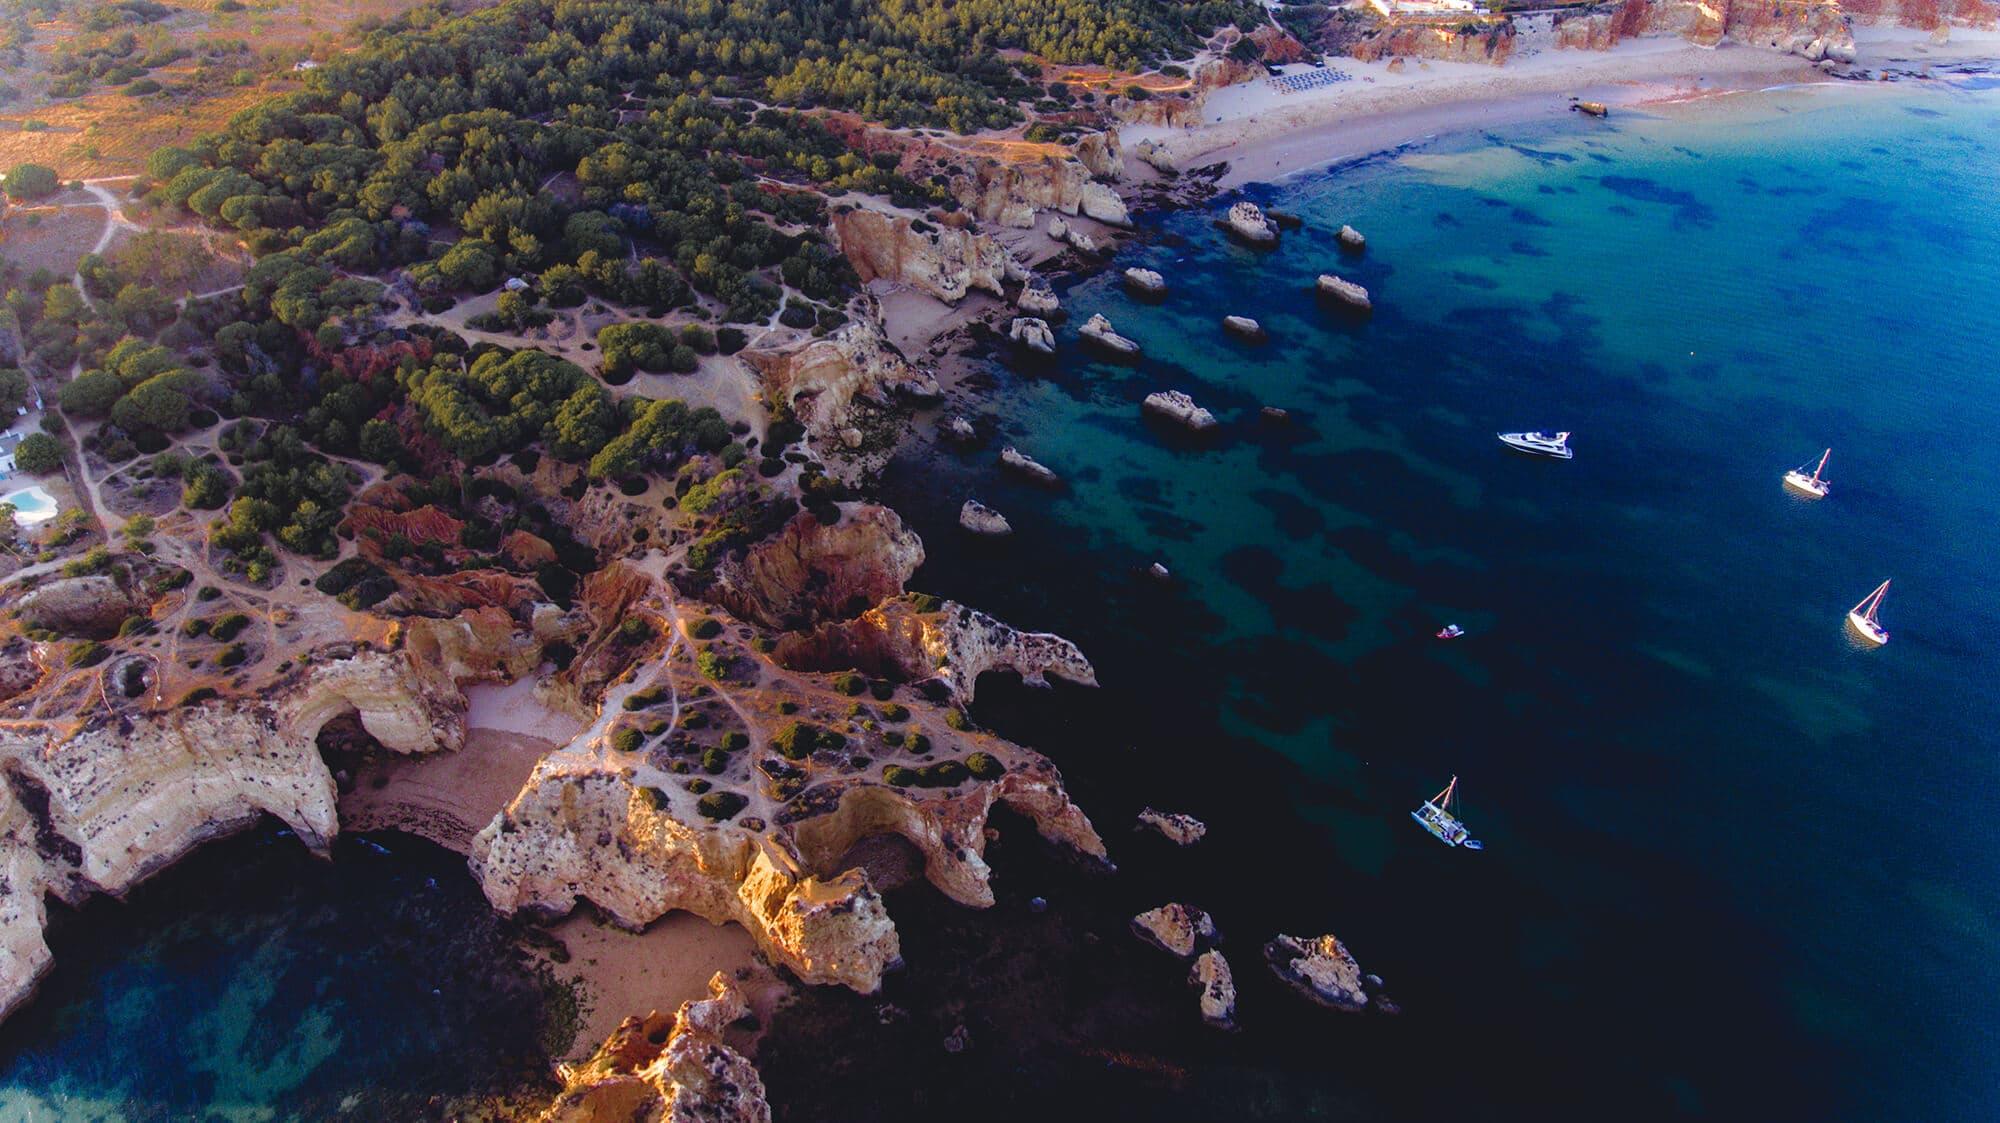 SUP | Kayak Portimão Cave & Cliffs Tour